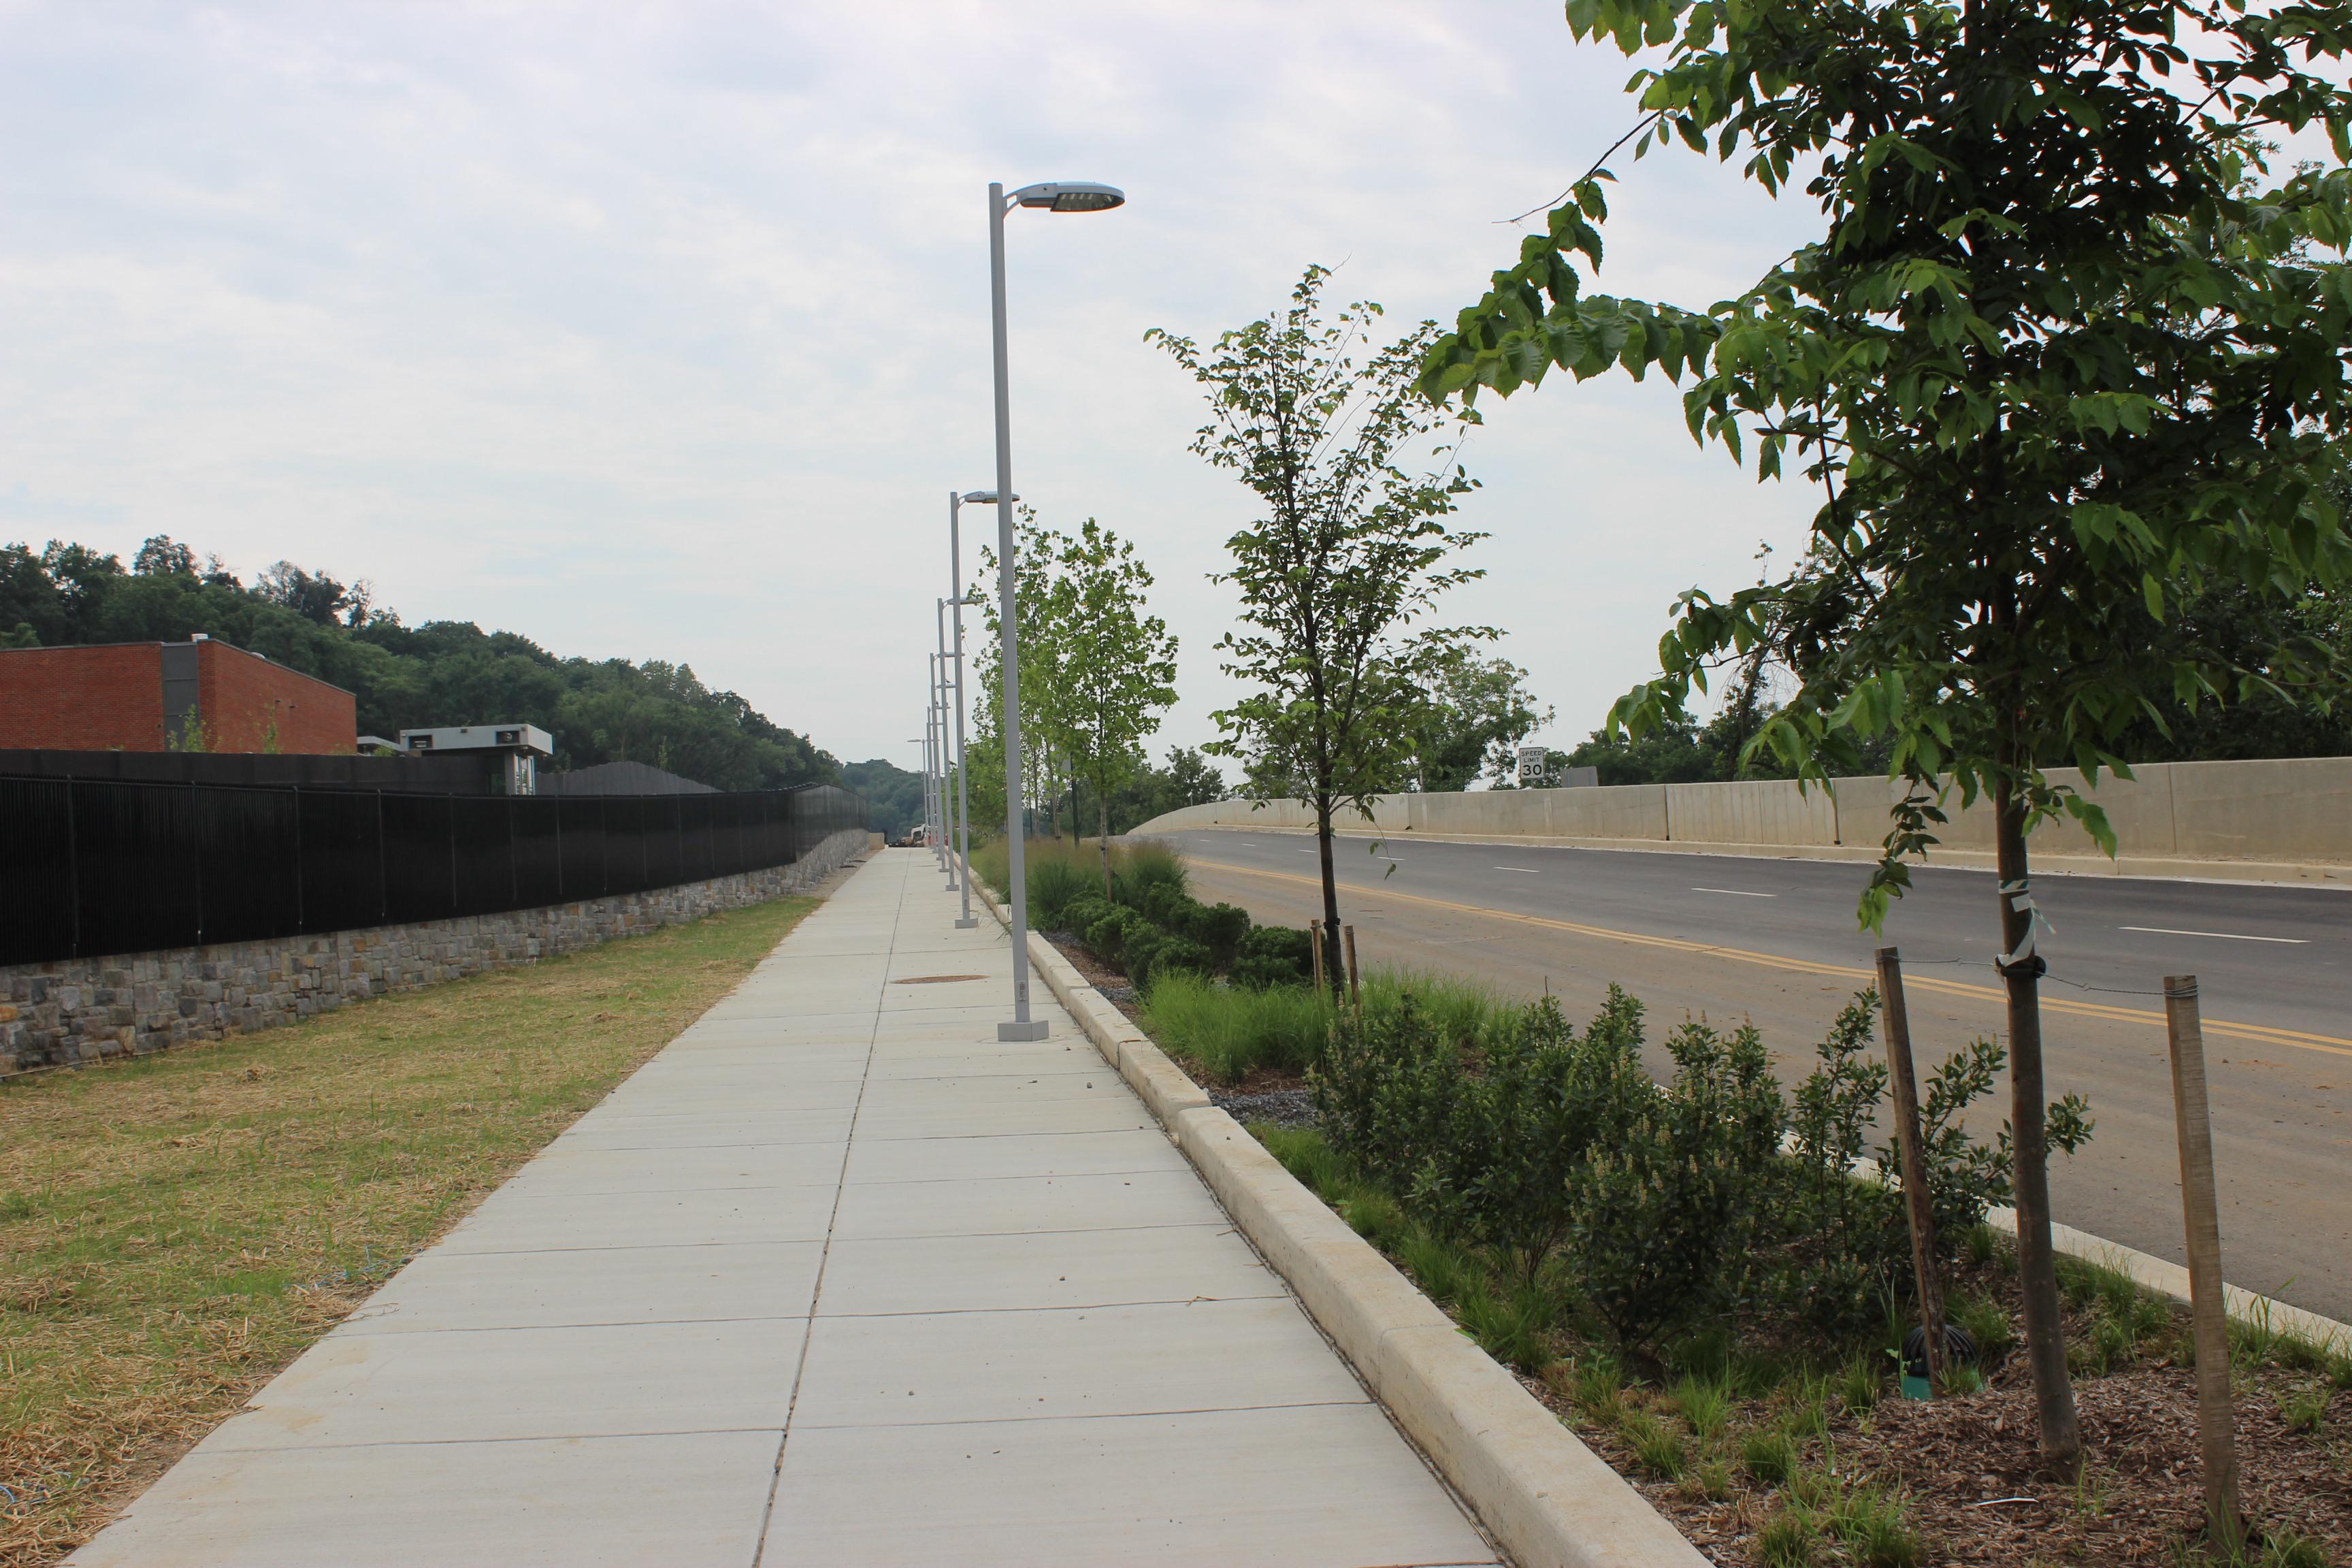 St. Elizabeth's Campus Access Road